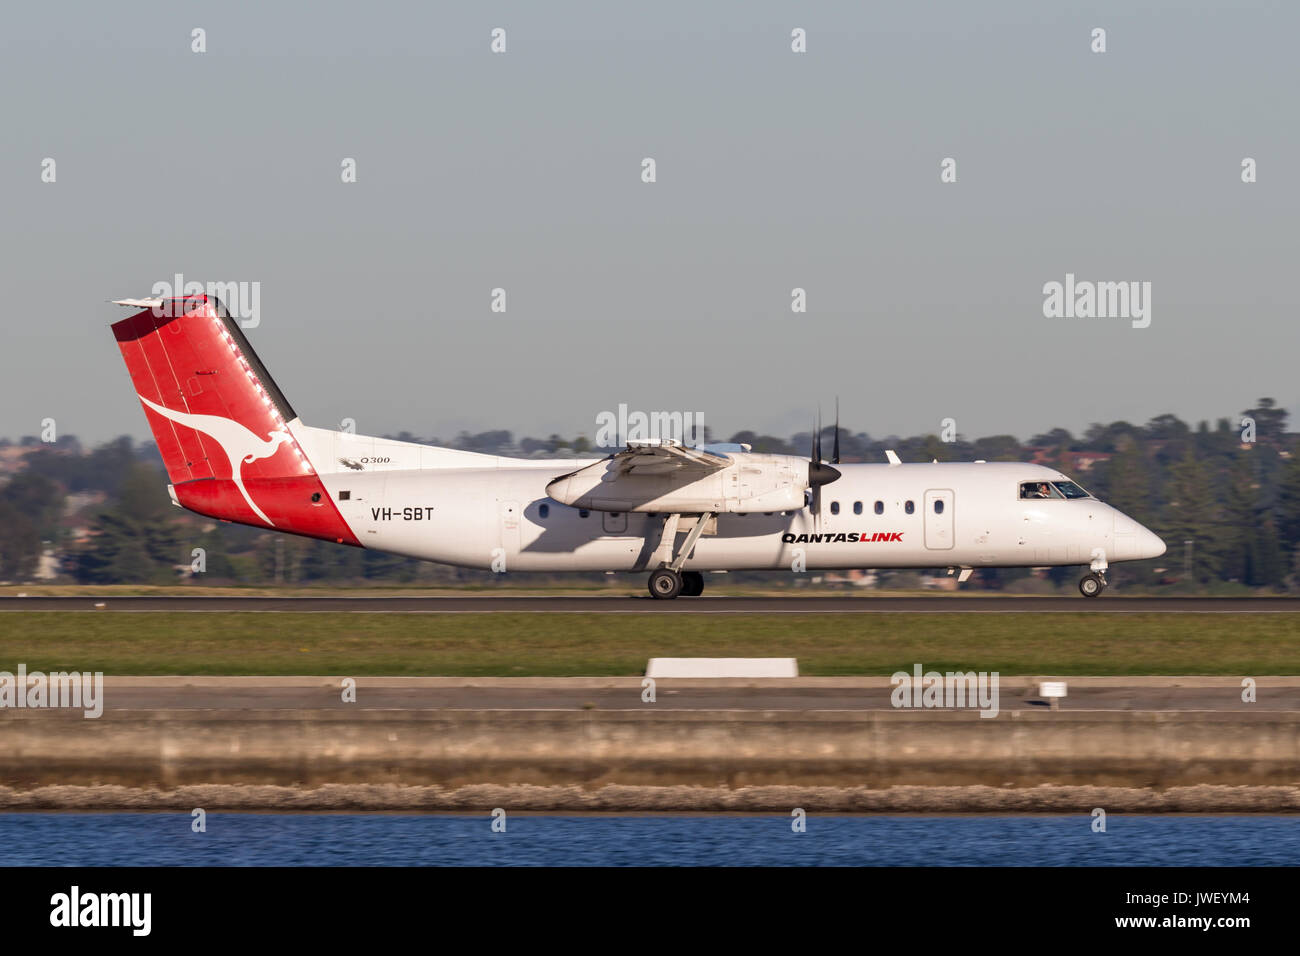 QantasLink (Qantas) deHavilland DHC-8 (Dash 8) twin engined regional airliner aircraft departing Sydney Airport. Stock Photo